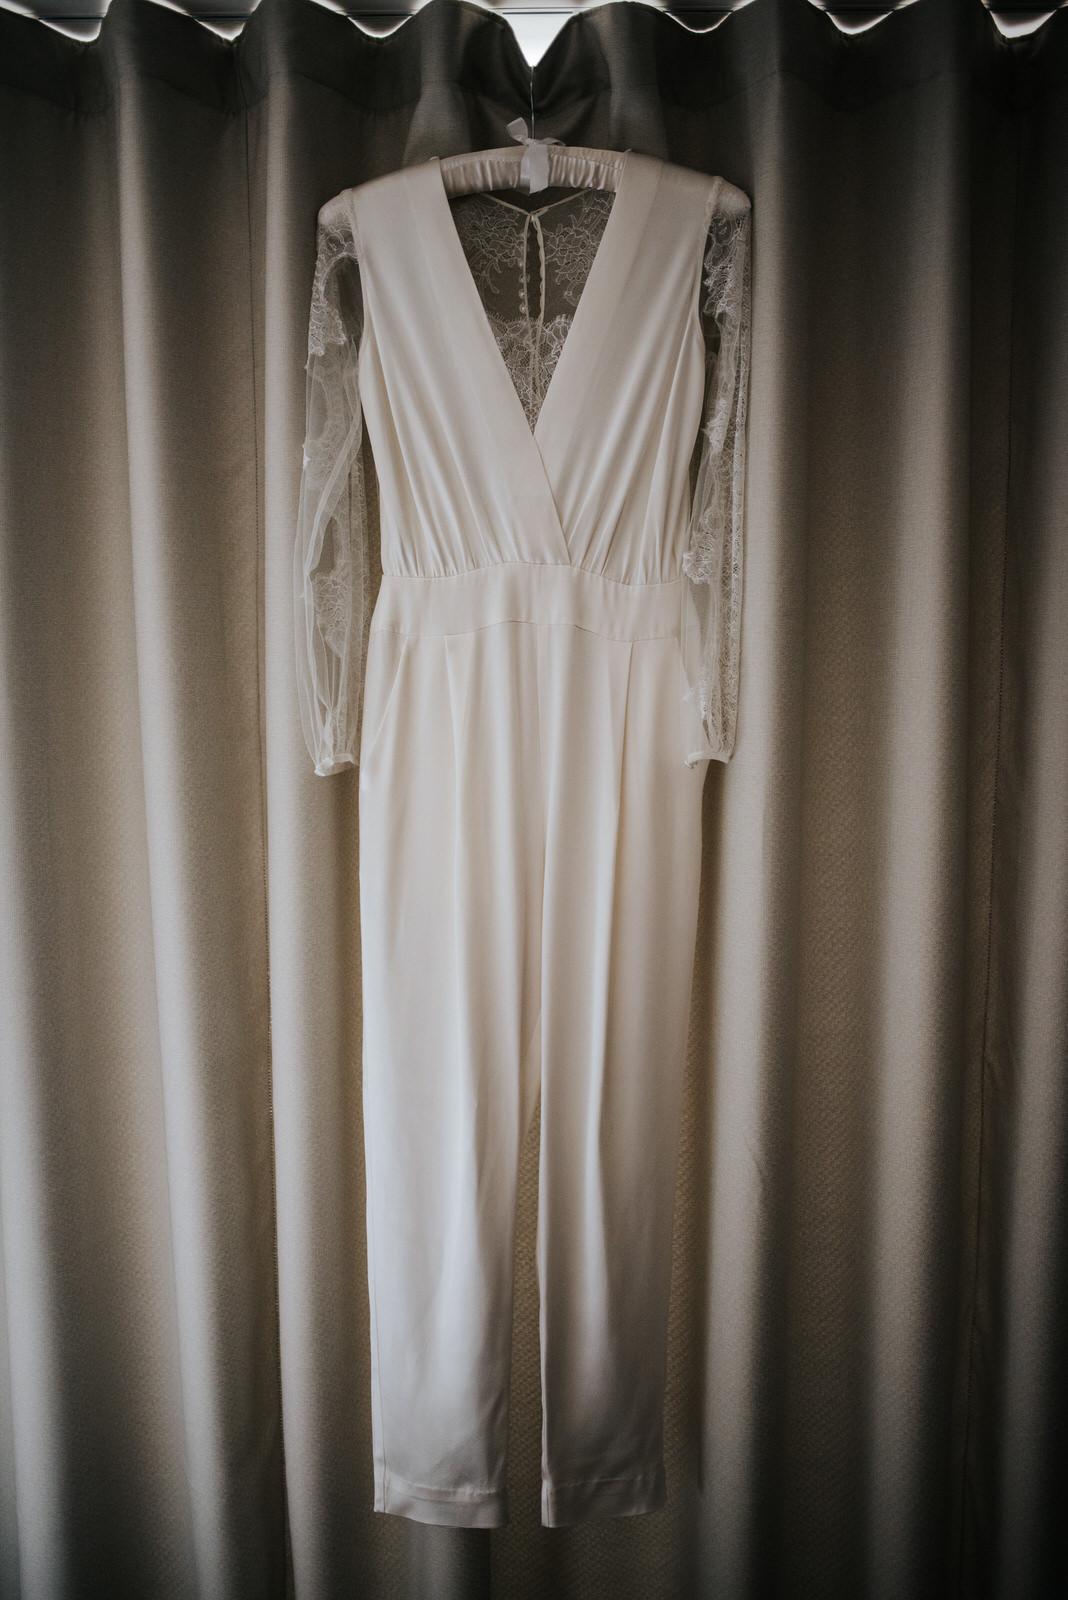 Bride's two-piece handmade wedding dress hanging by the window